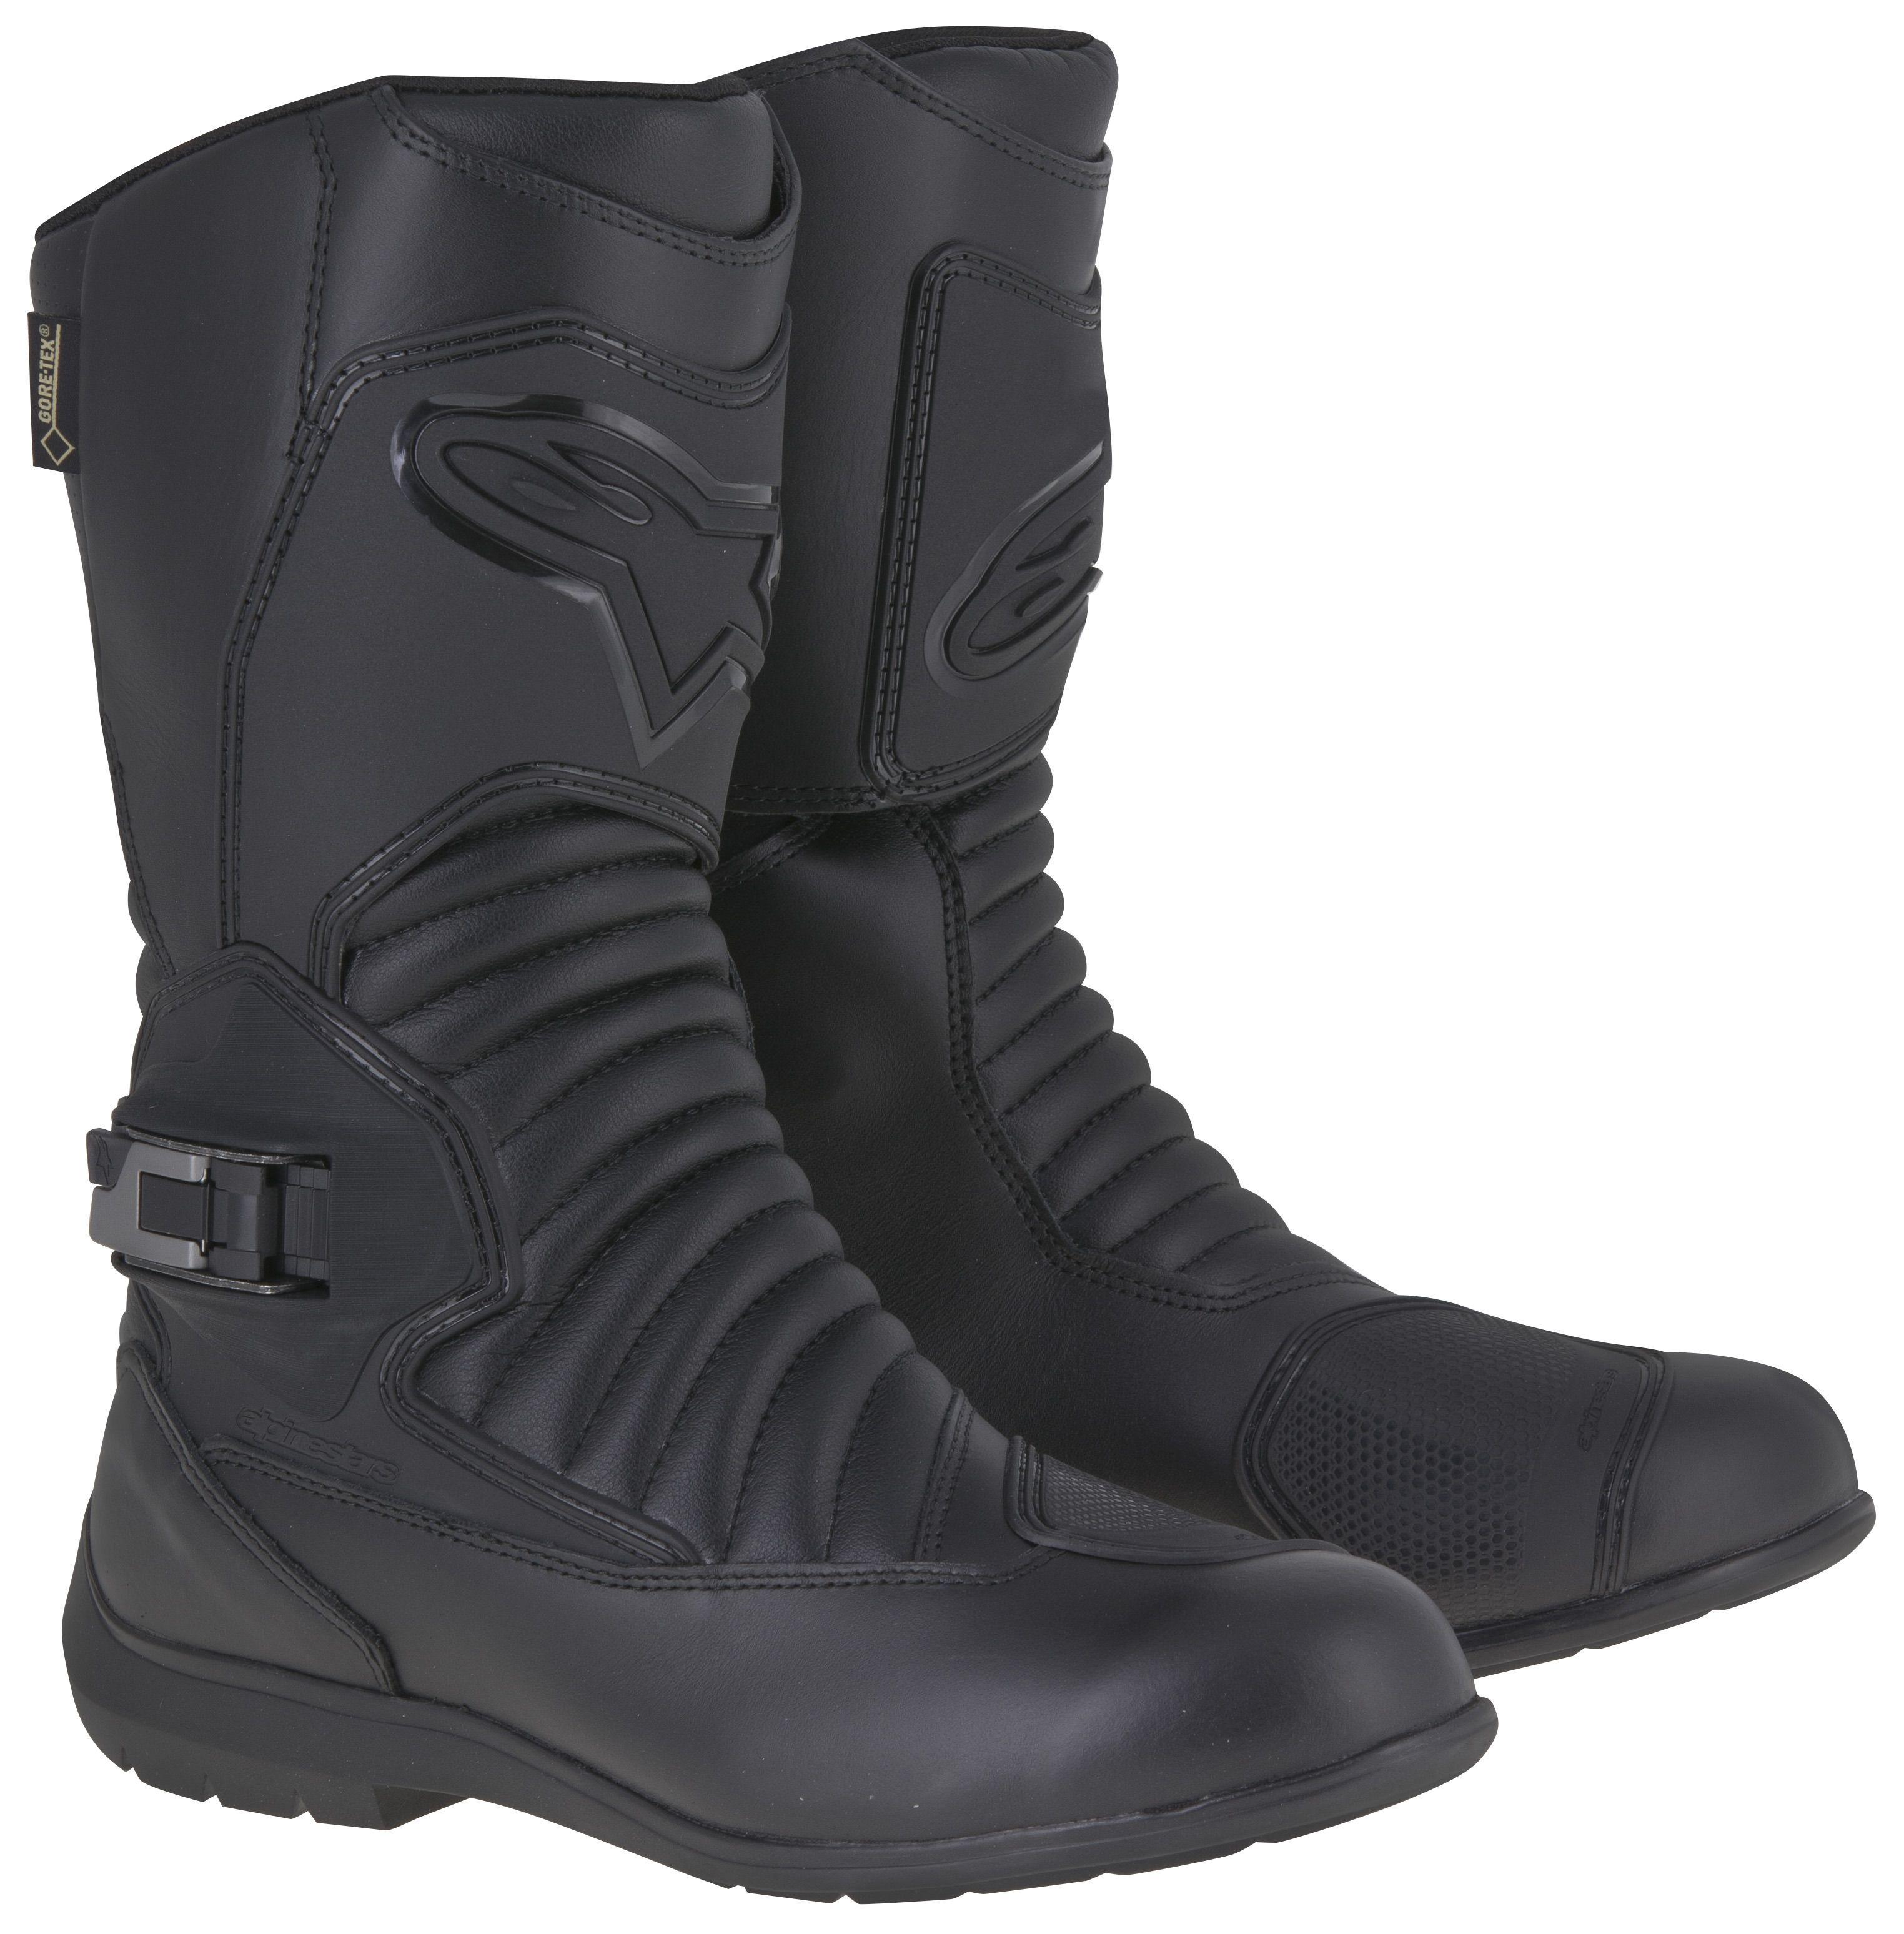 Alpinestars Supertouring Gore Tex Boots Revzilla